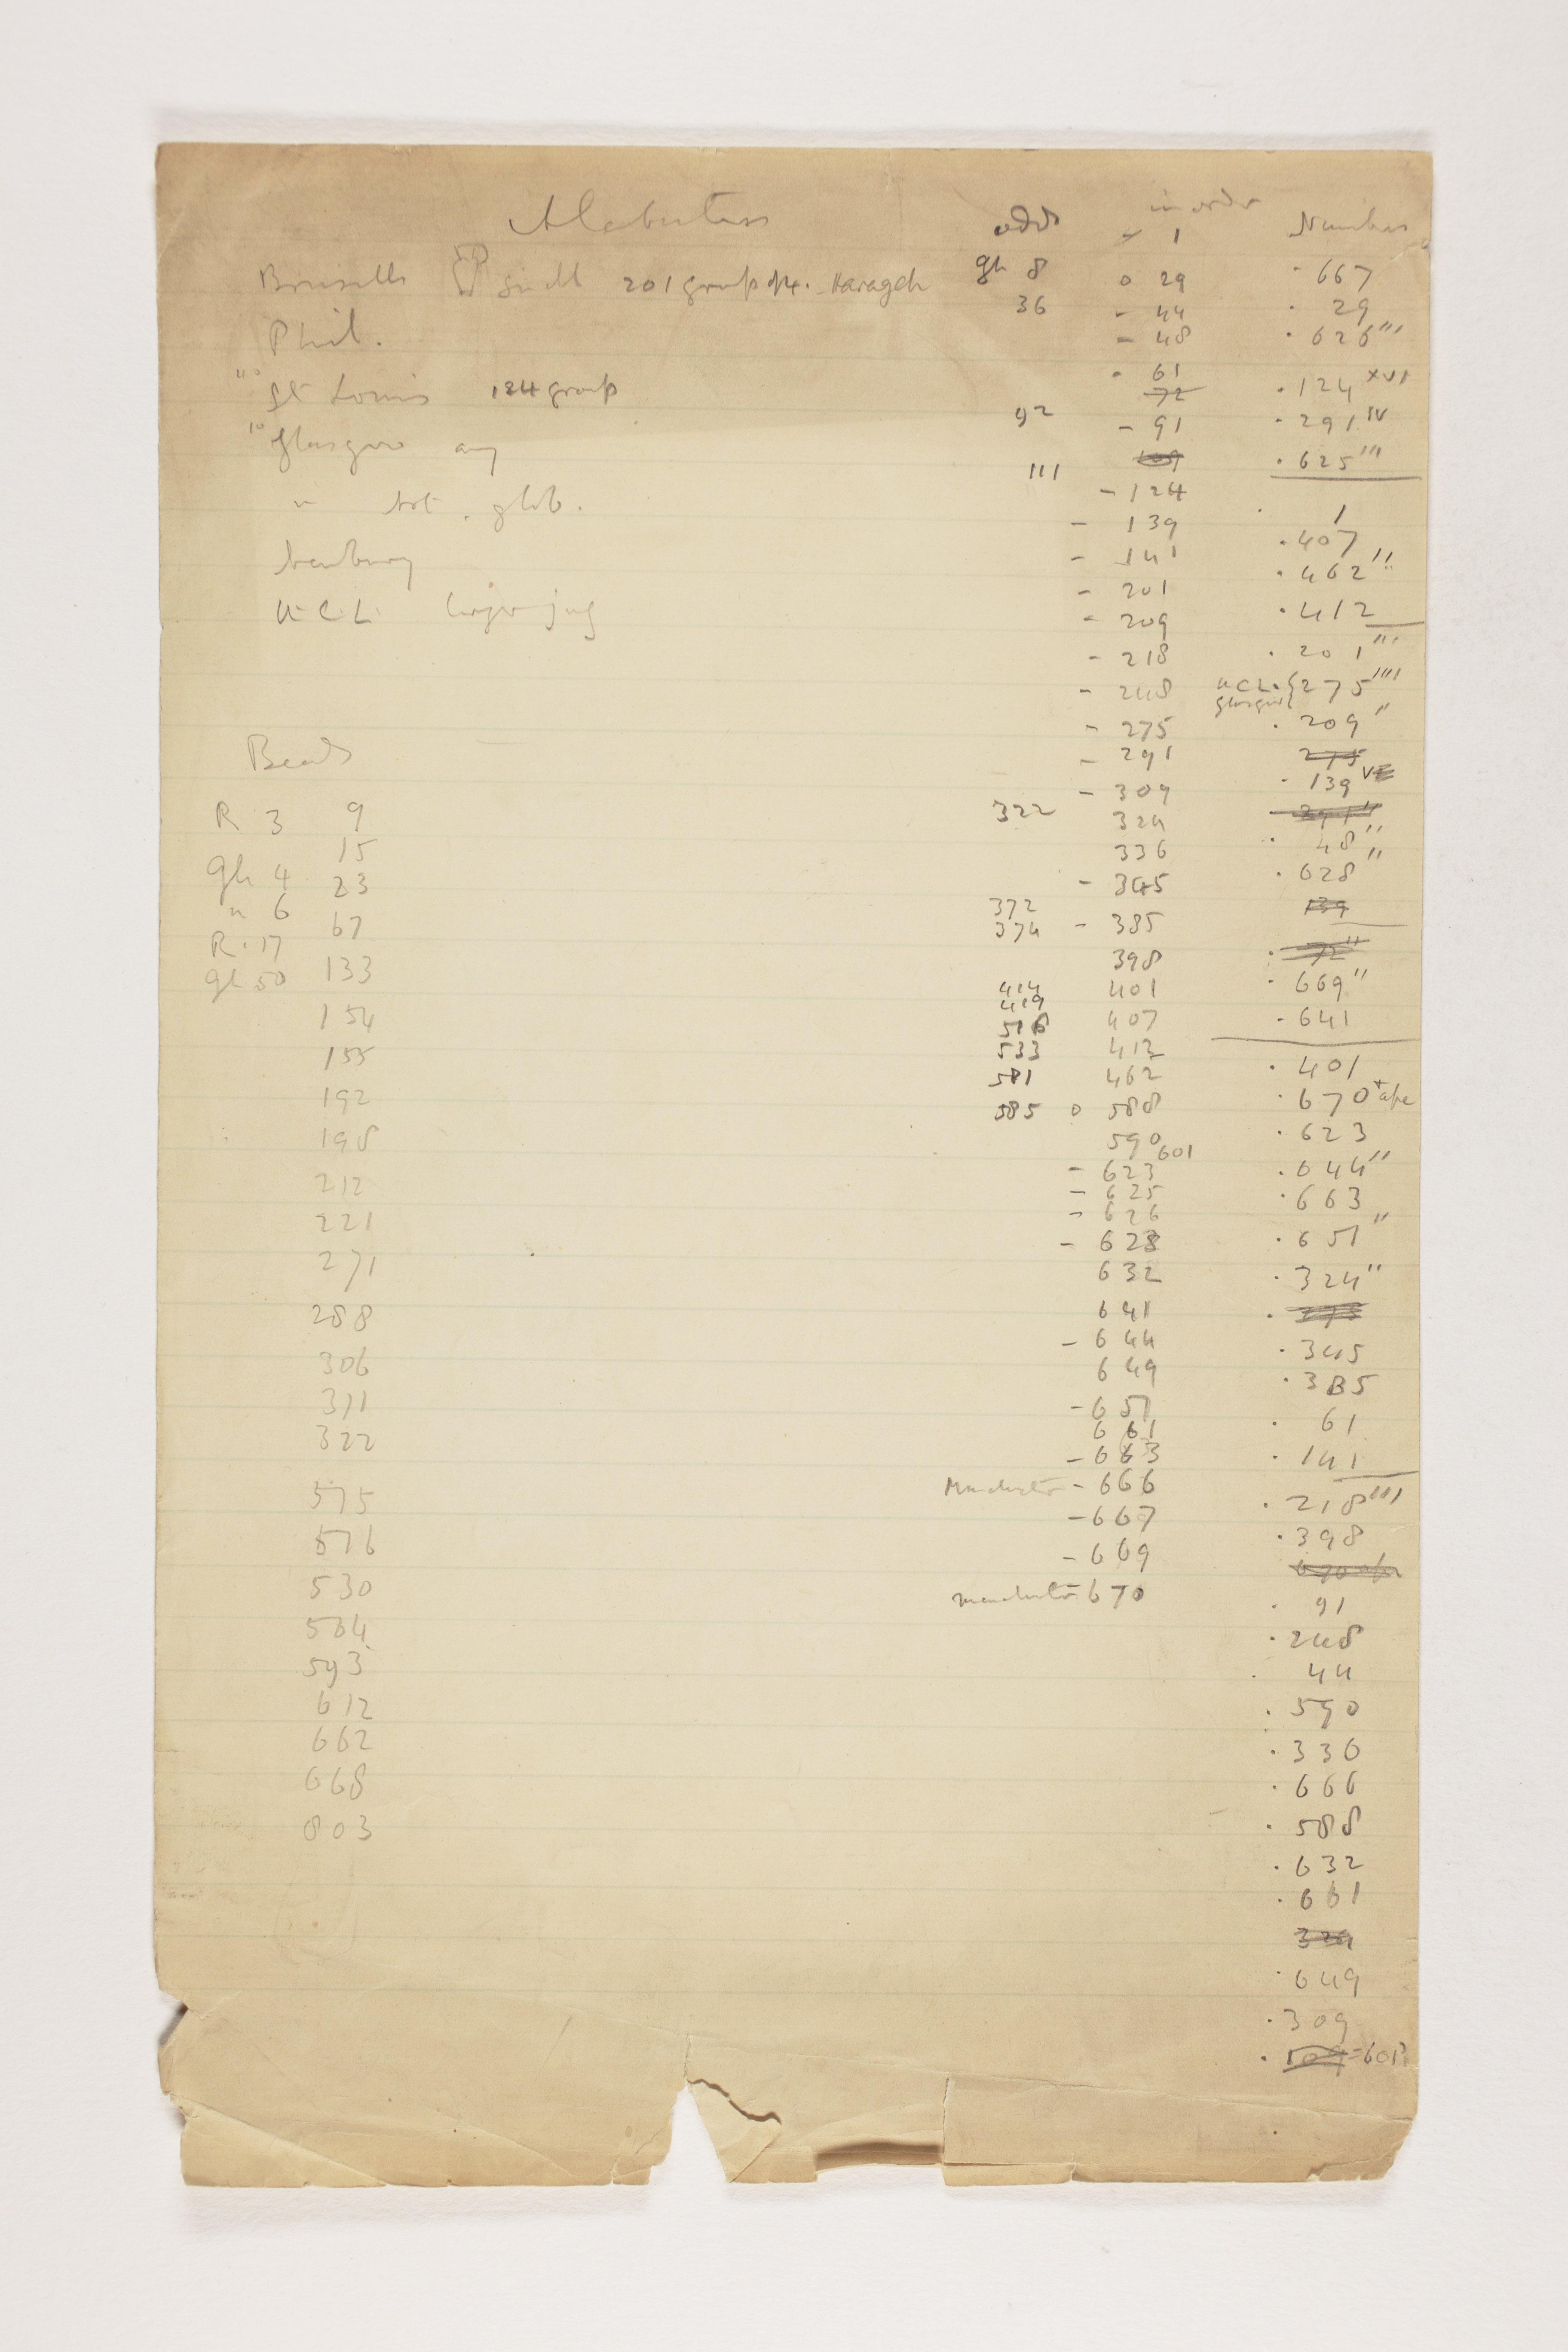 1913-14 Lahun, Haraga Object list PMA/WFP1/D/22/19